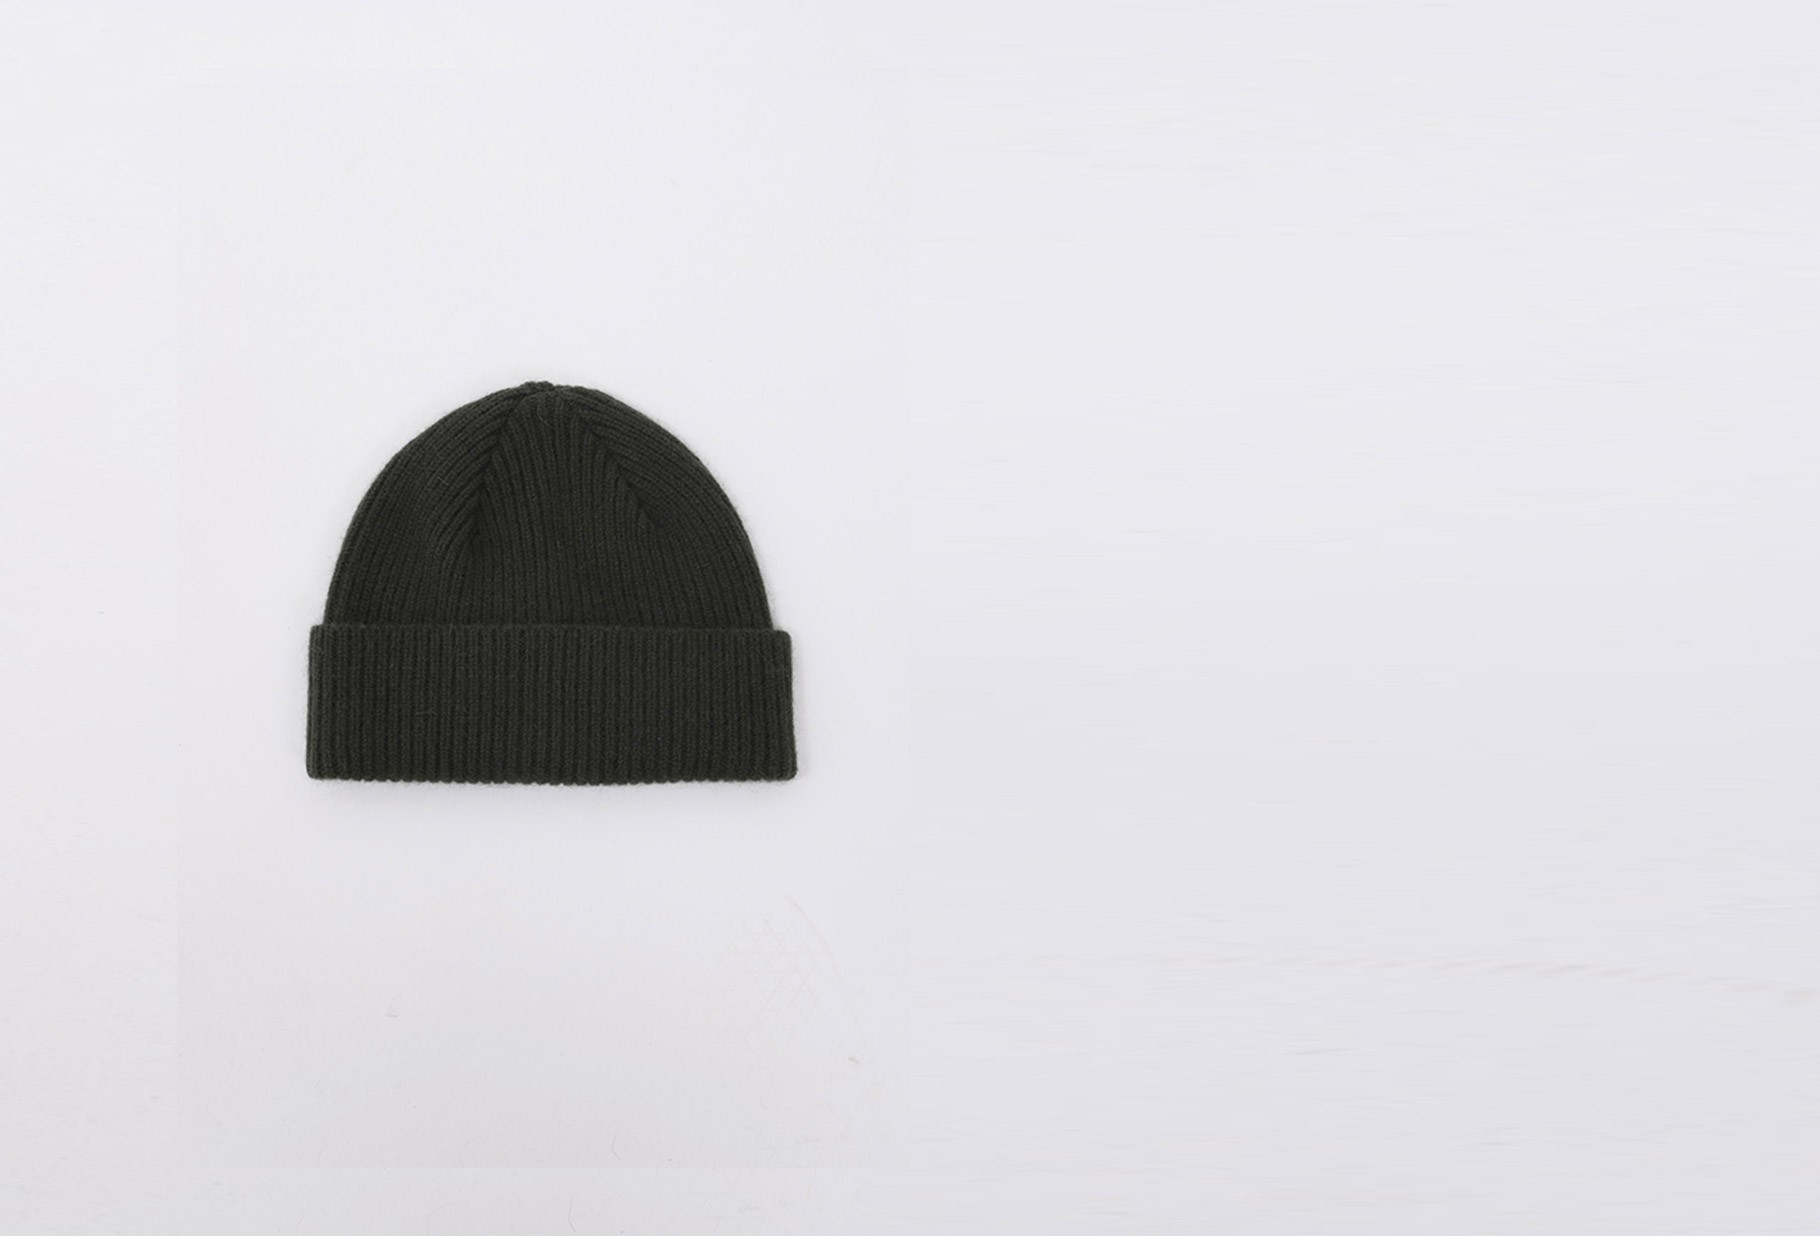 MACKIE / Barra hat Cedar